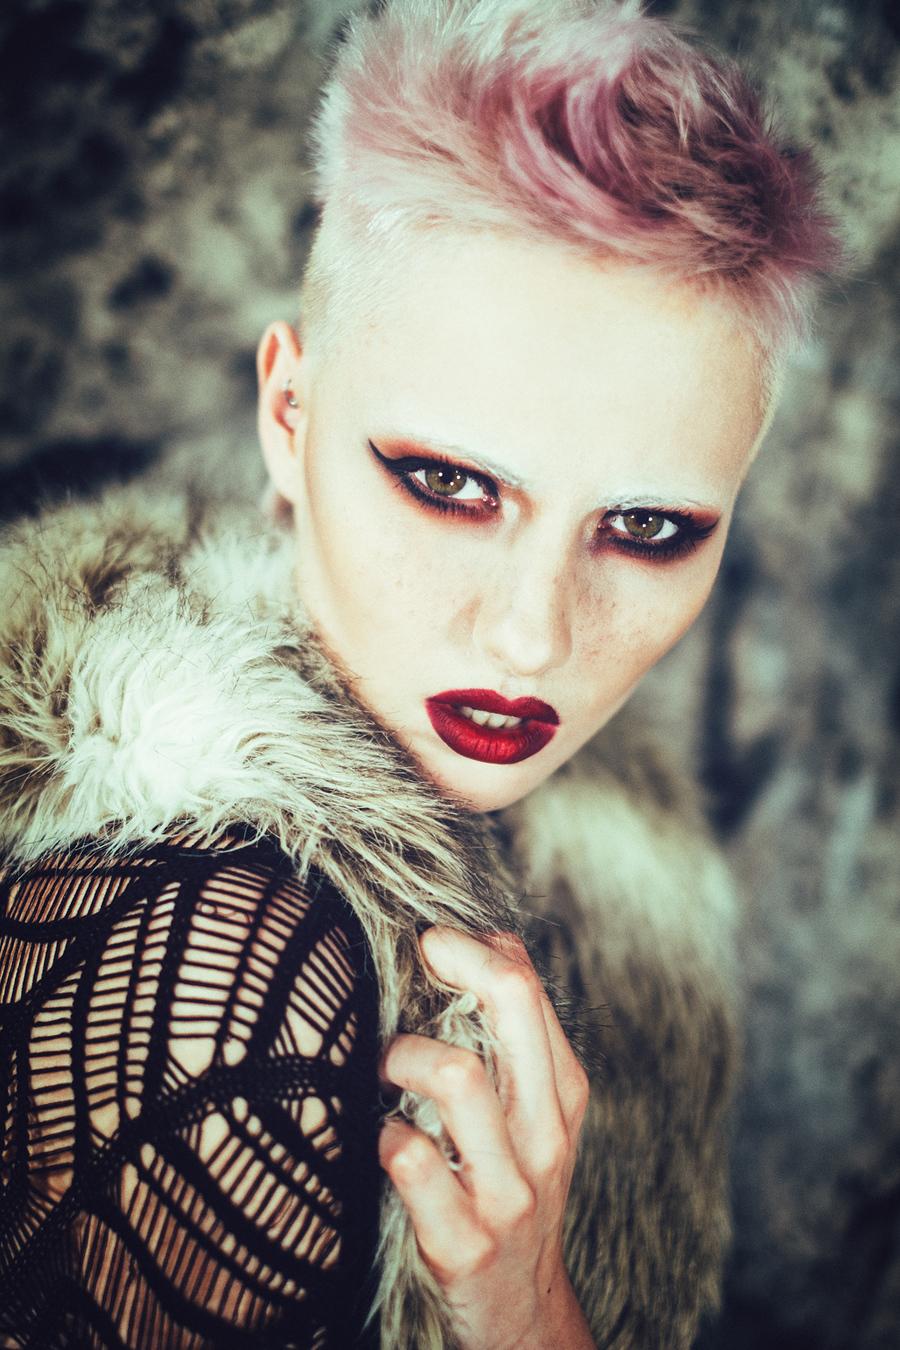 Vikingess / Model Jessica Wilcock / Uploaded 5th June 2016 @ 08:43 PM